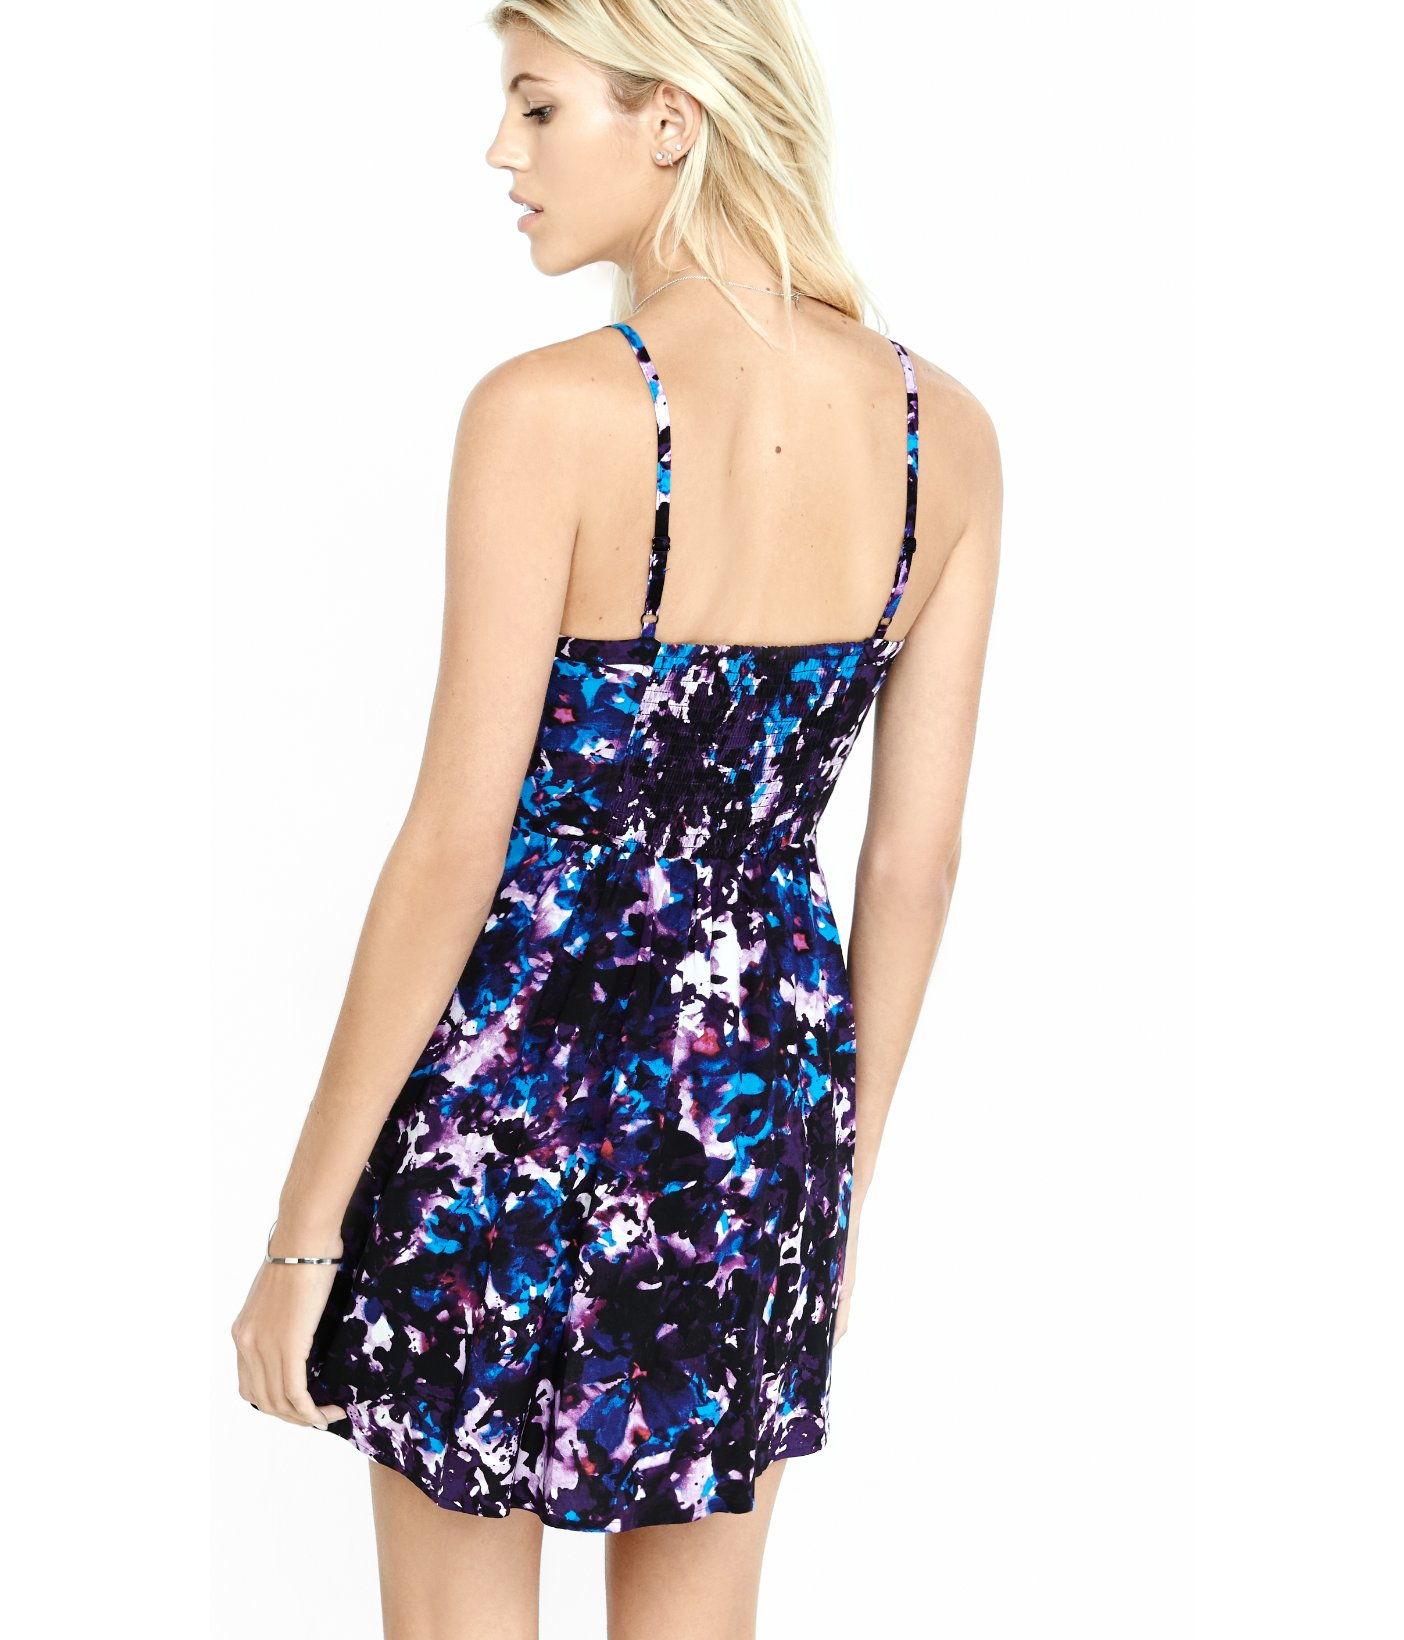 838c49824c Express Sweetheart Neckline Cami Sundress in Blue - Lyst